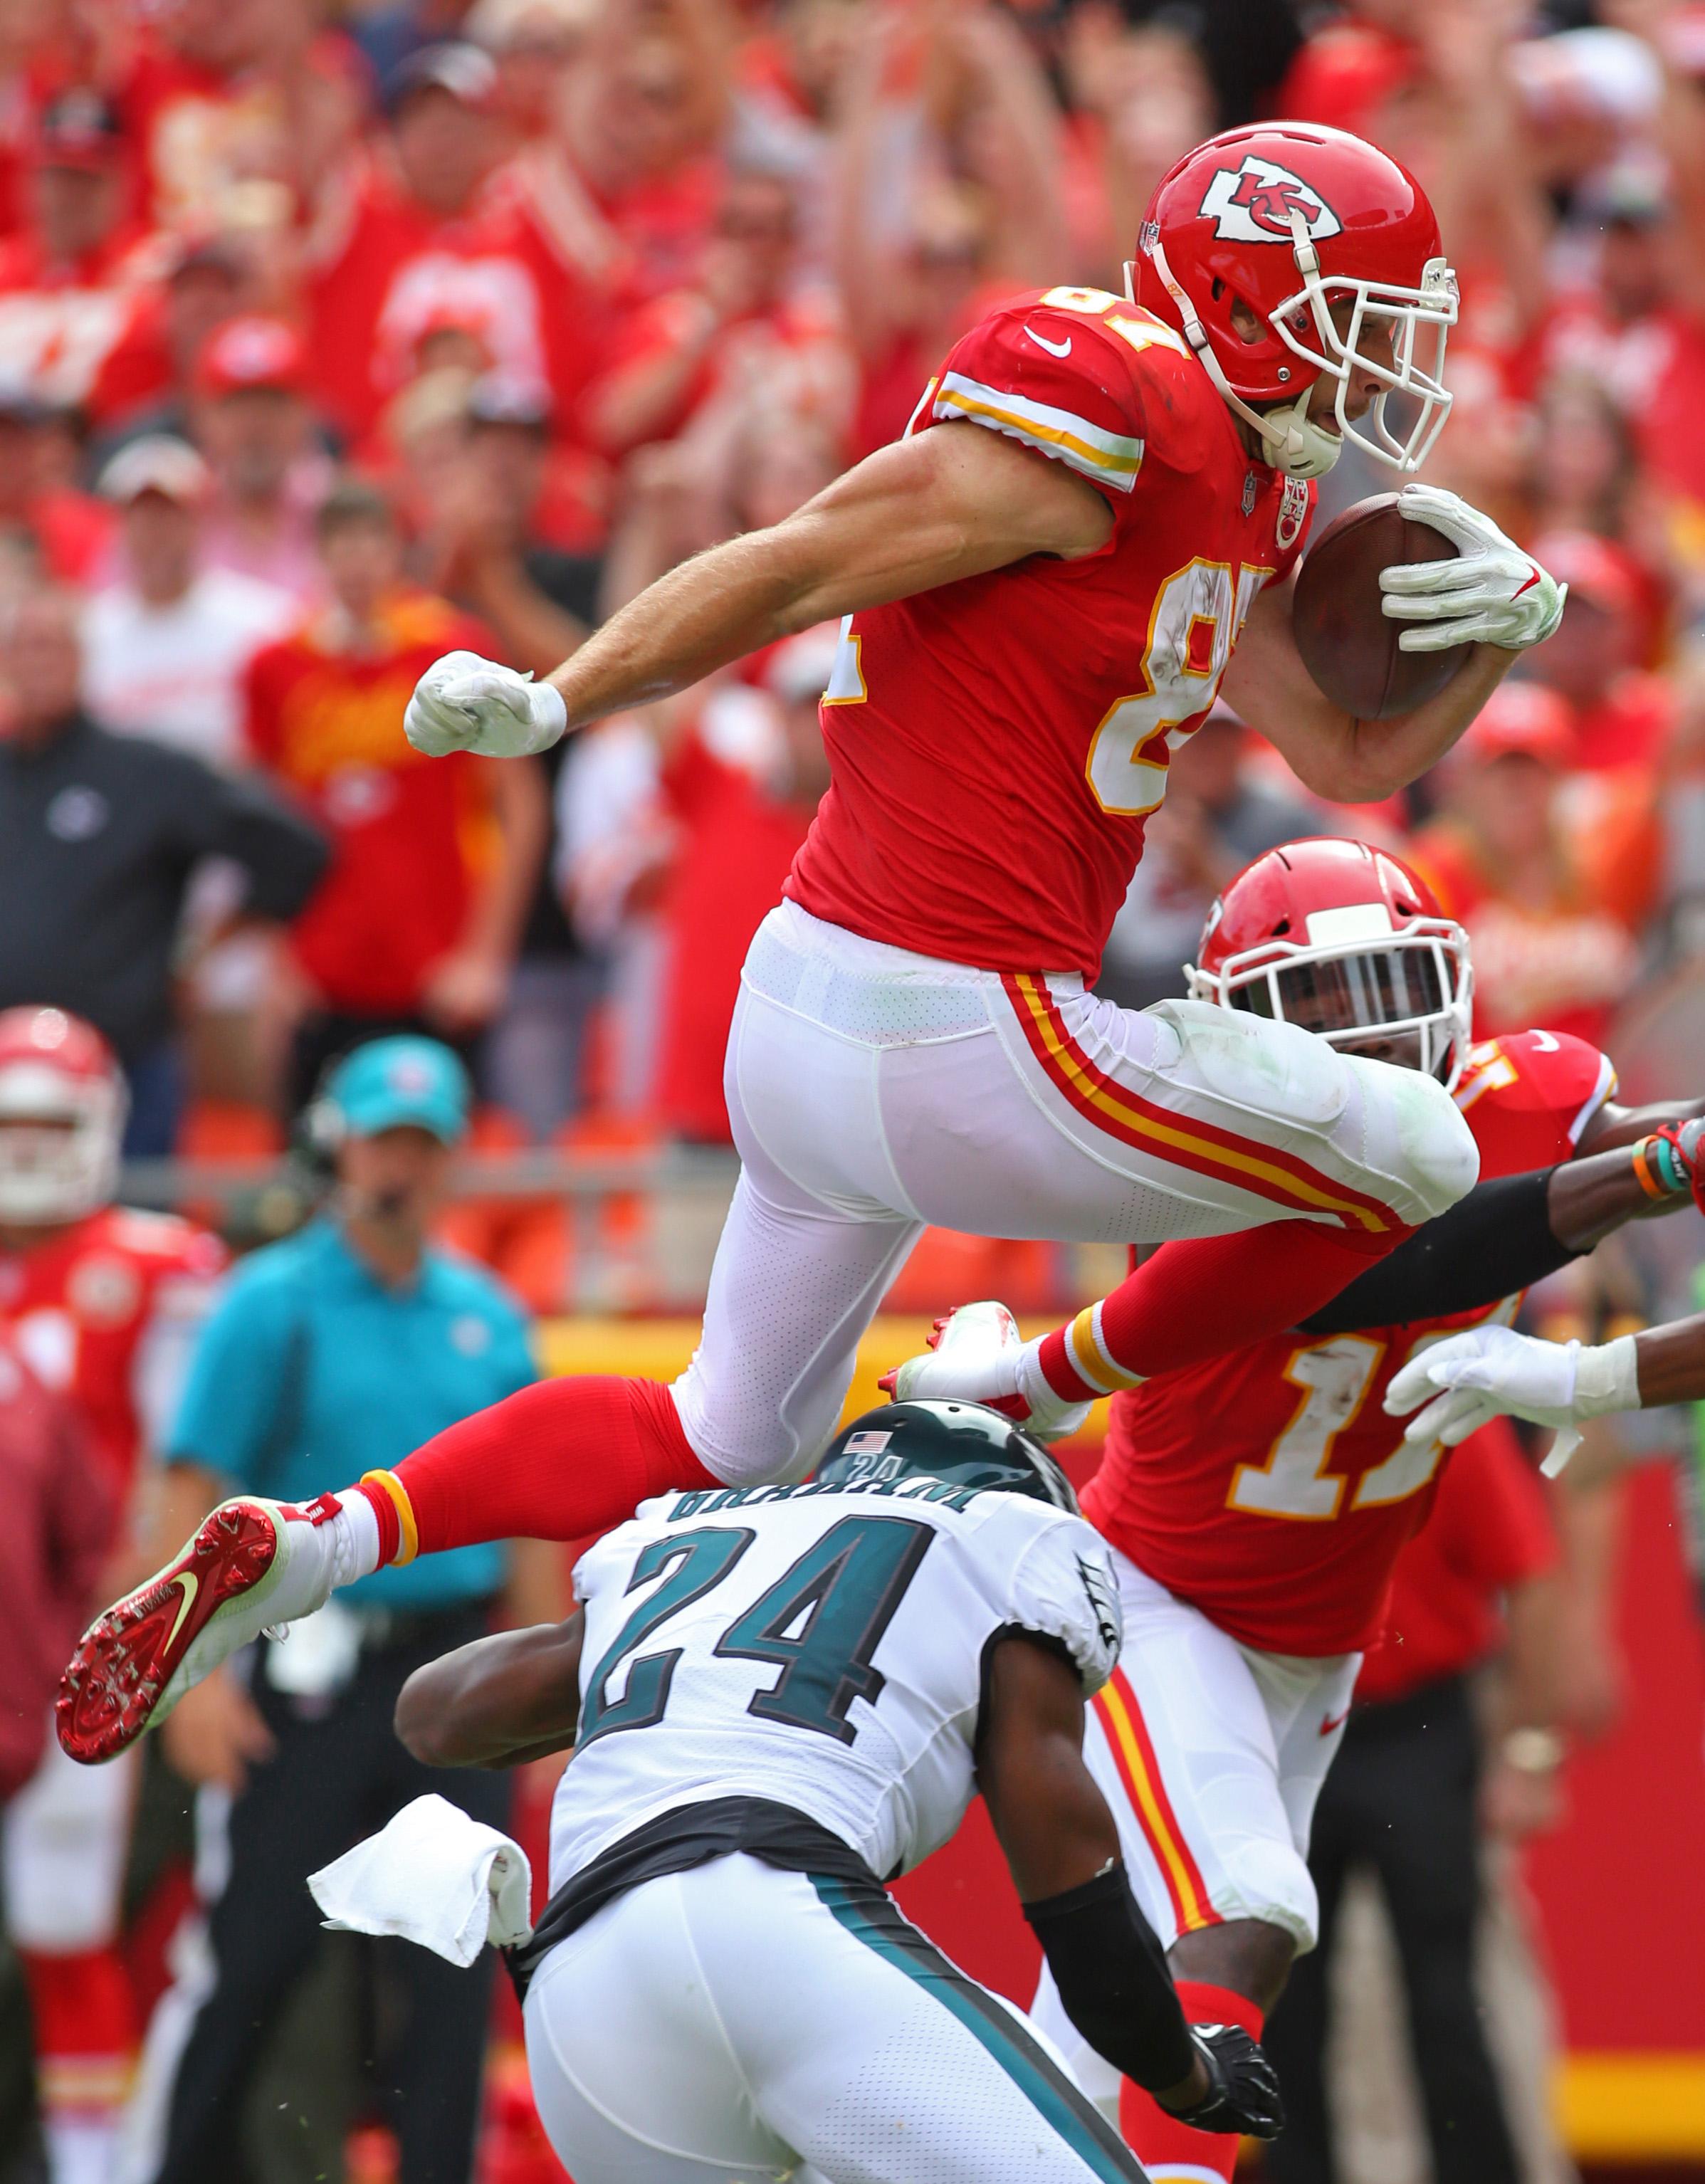 NFL: Philadelphia Eagles at Kansas City Chiefs